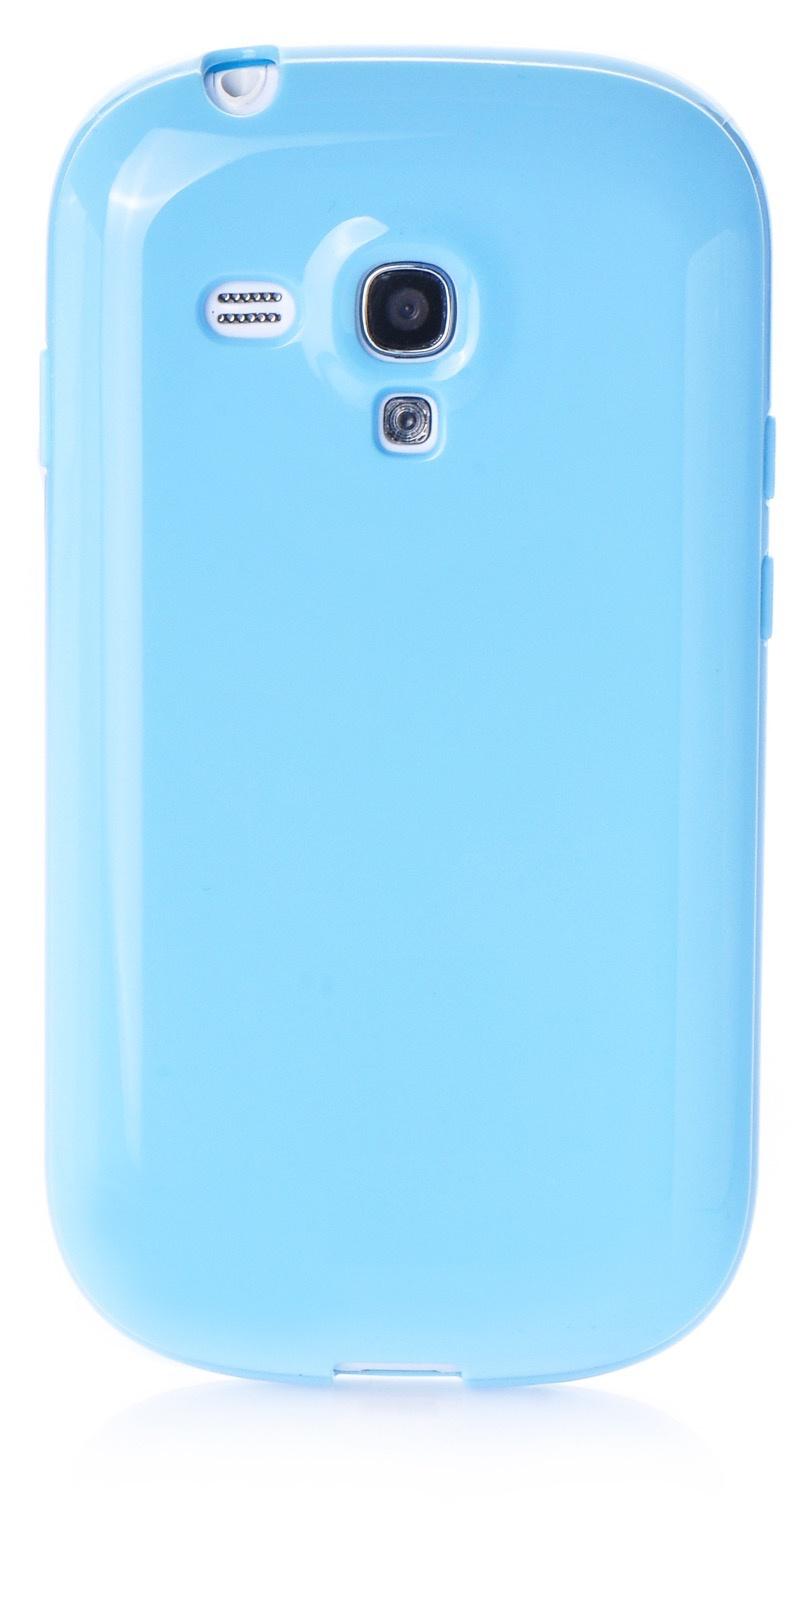 Чехол iNeez накладка силикон мыльница light blue для Samsung Galaxy S3 mini,420032, голубой